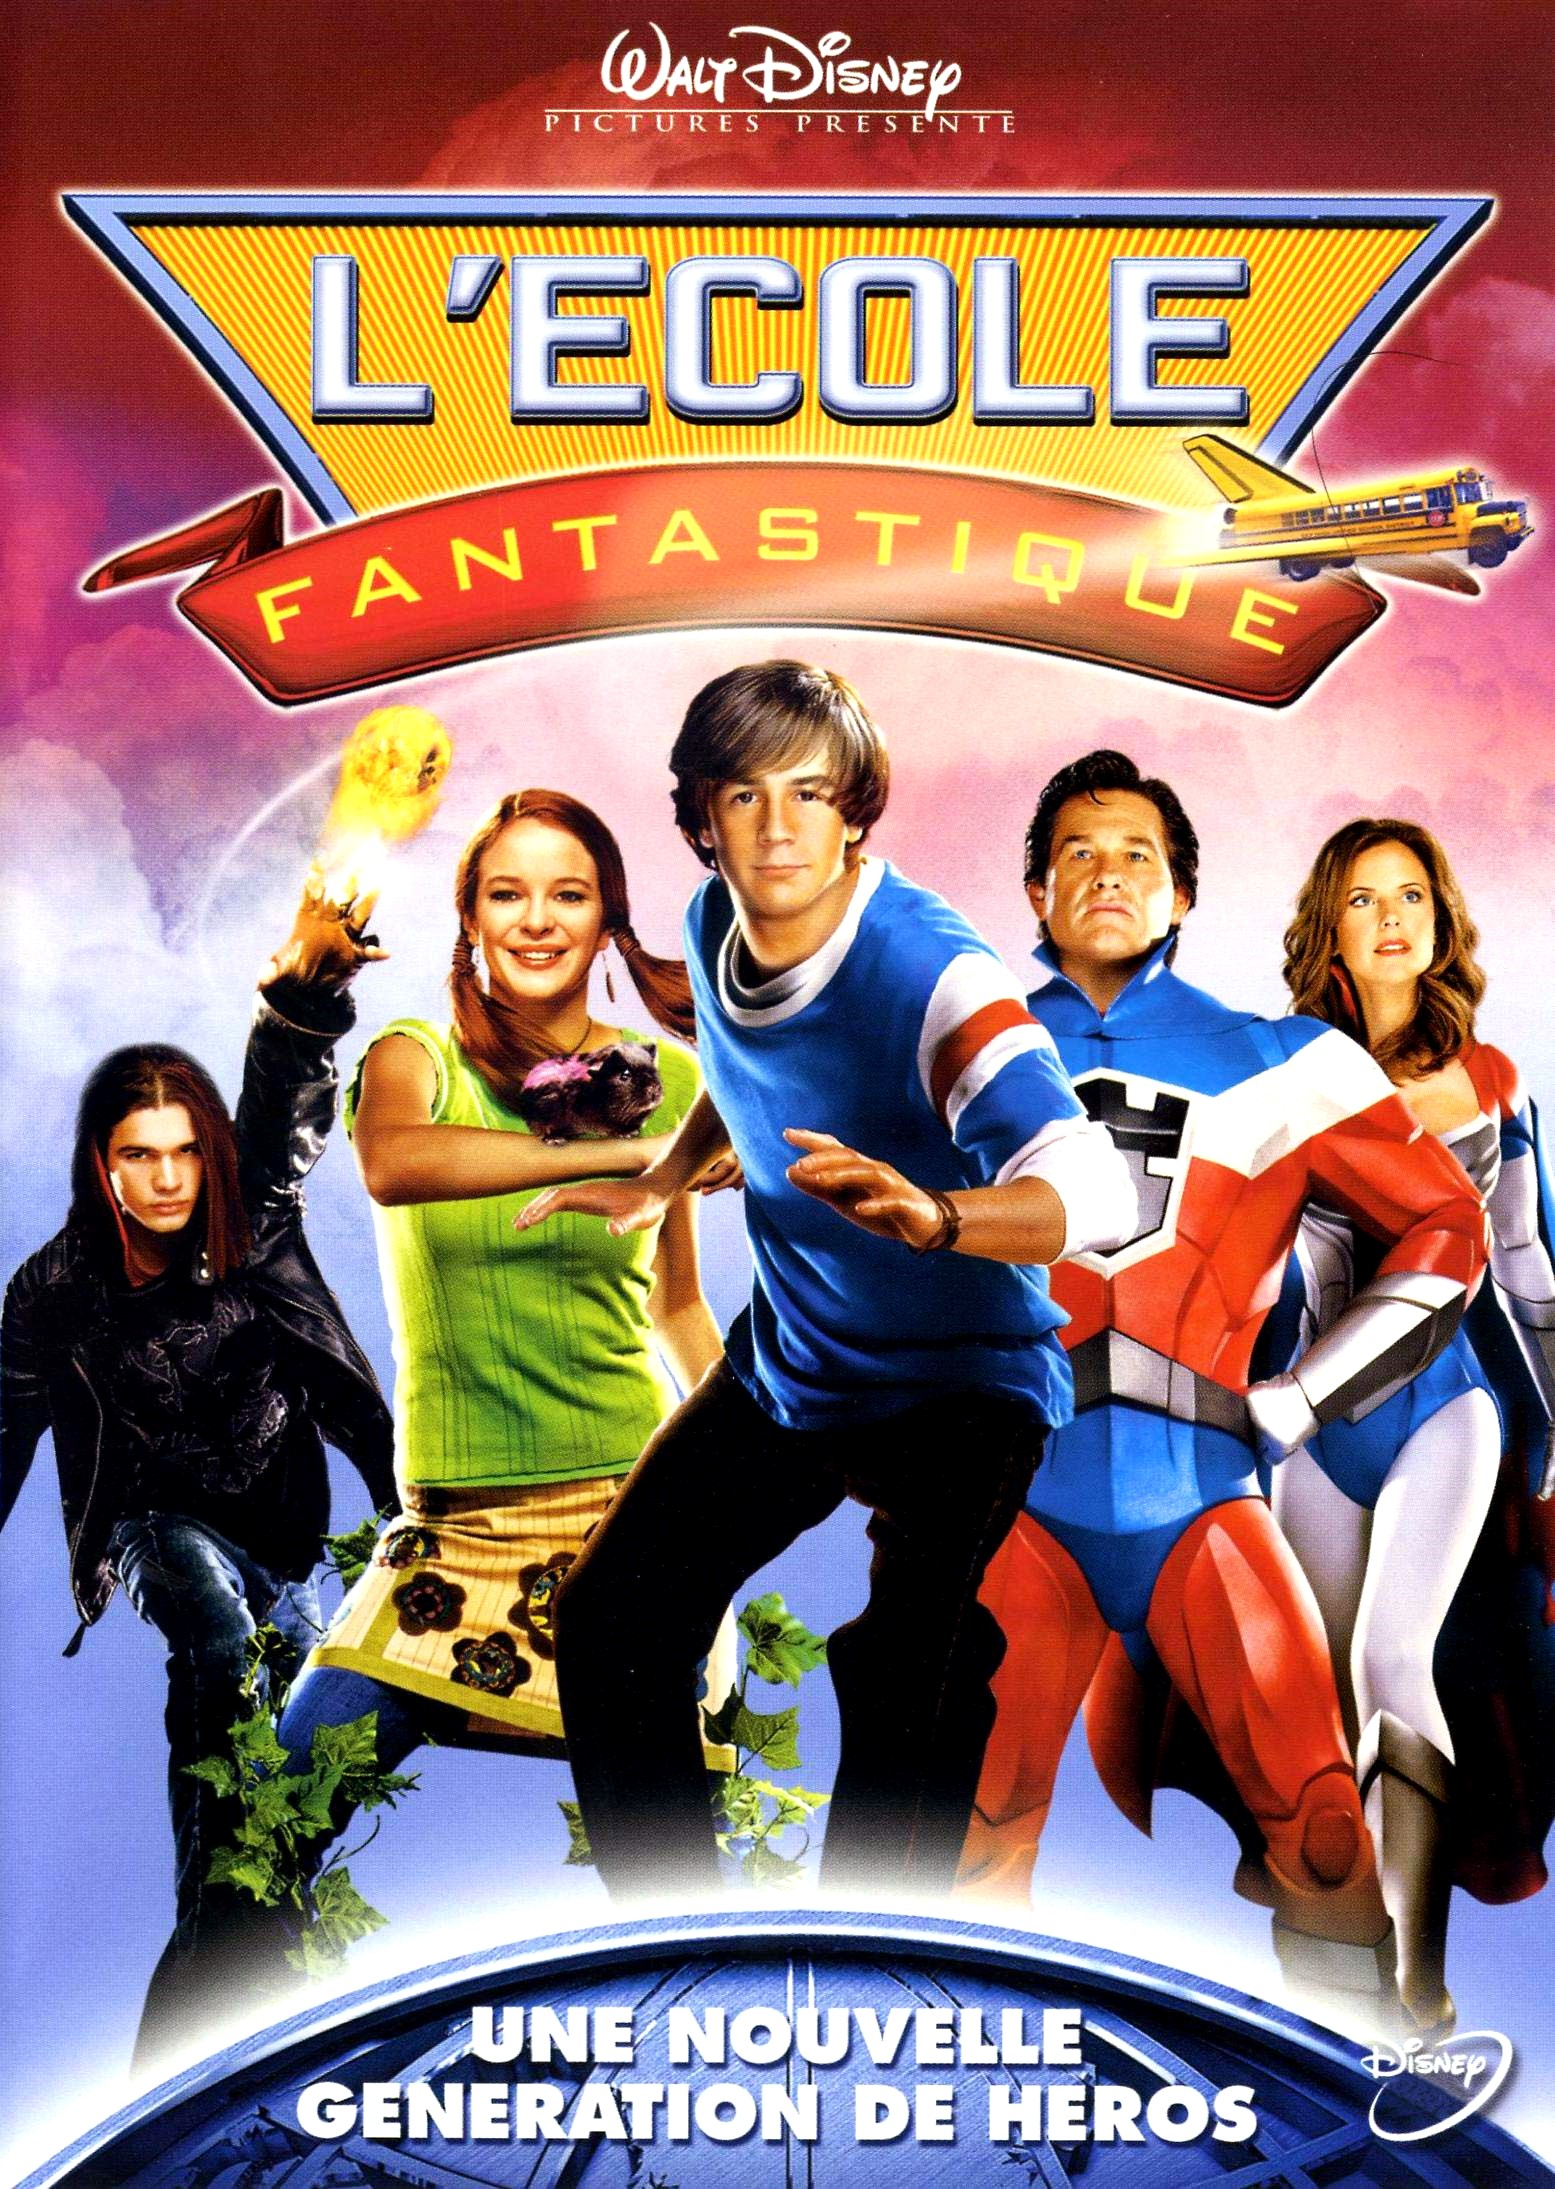 walt disney company walt disney pictures affiche ecole fantastique poster sky high